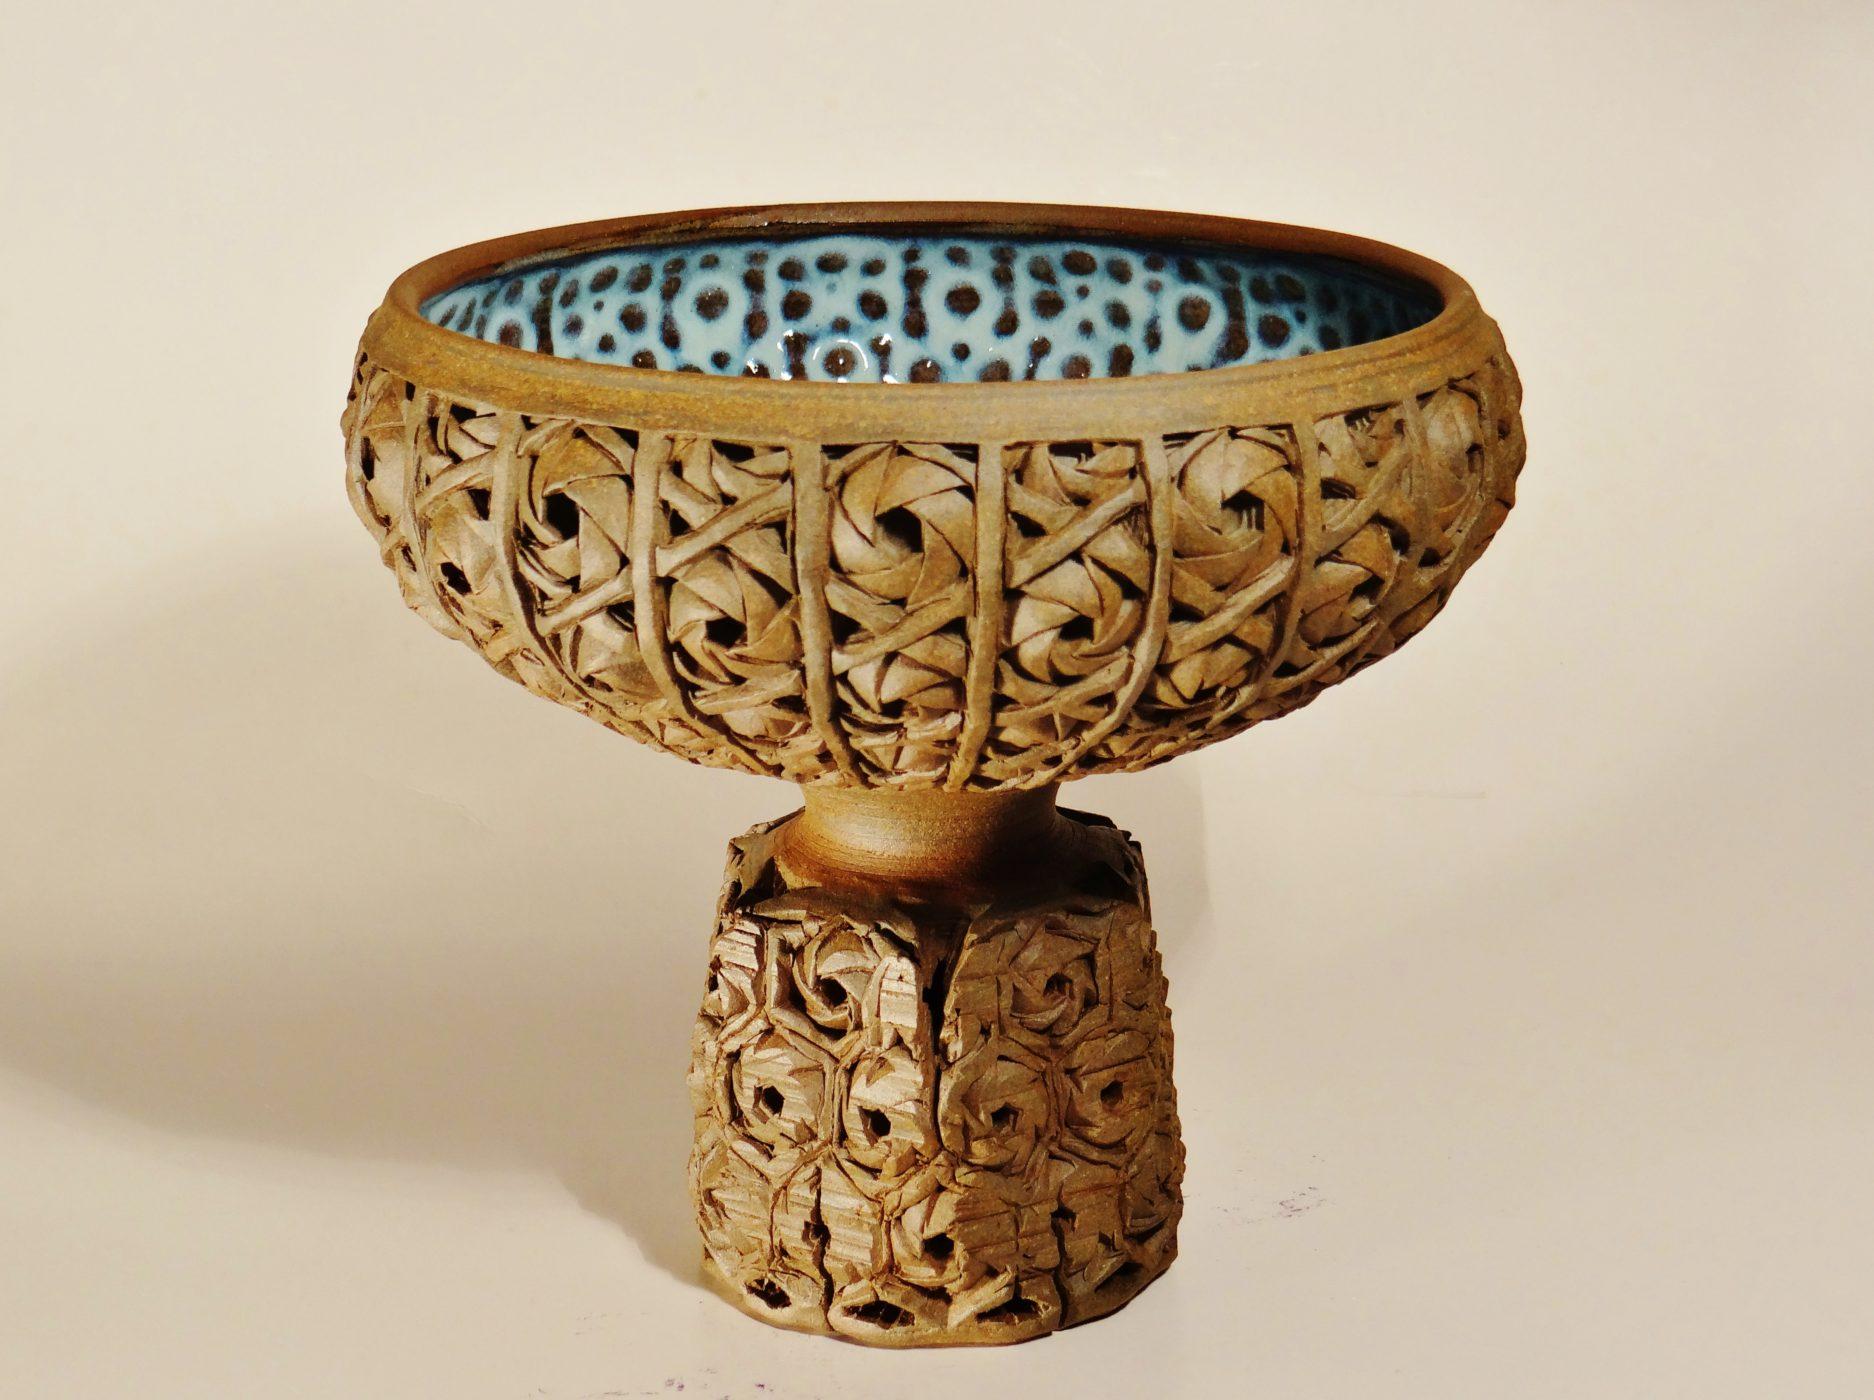 plateforme g olocalisation artisanat made in france morbihan saint jean la poterie thierry. Black Bedroom Furniture Sets. Home Design Ideas